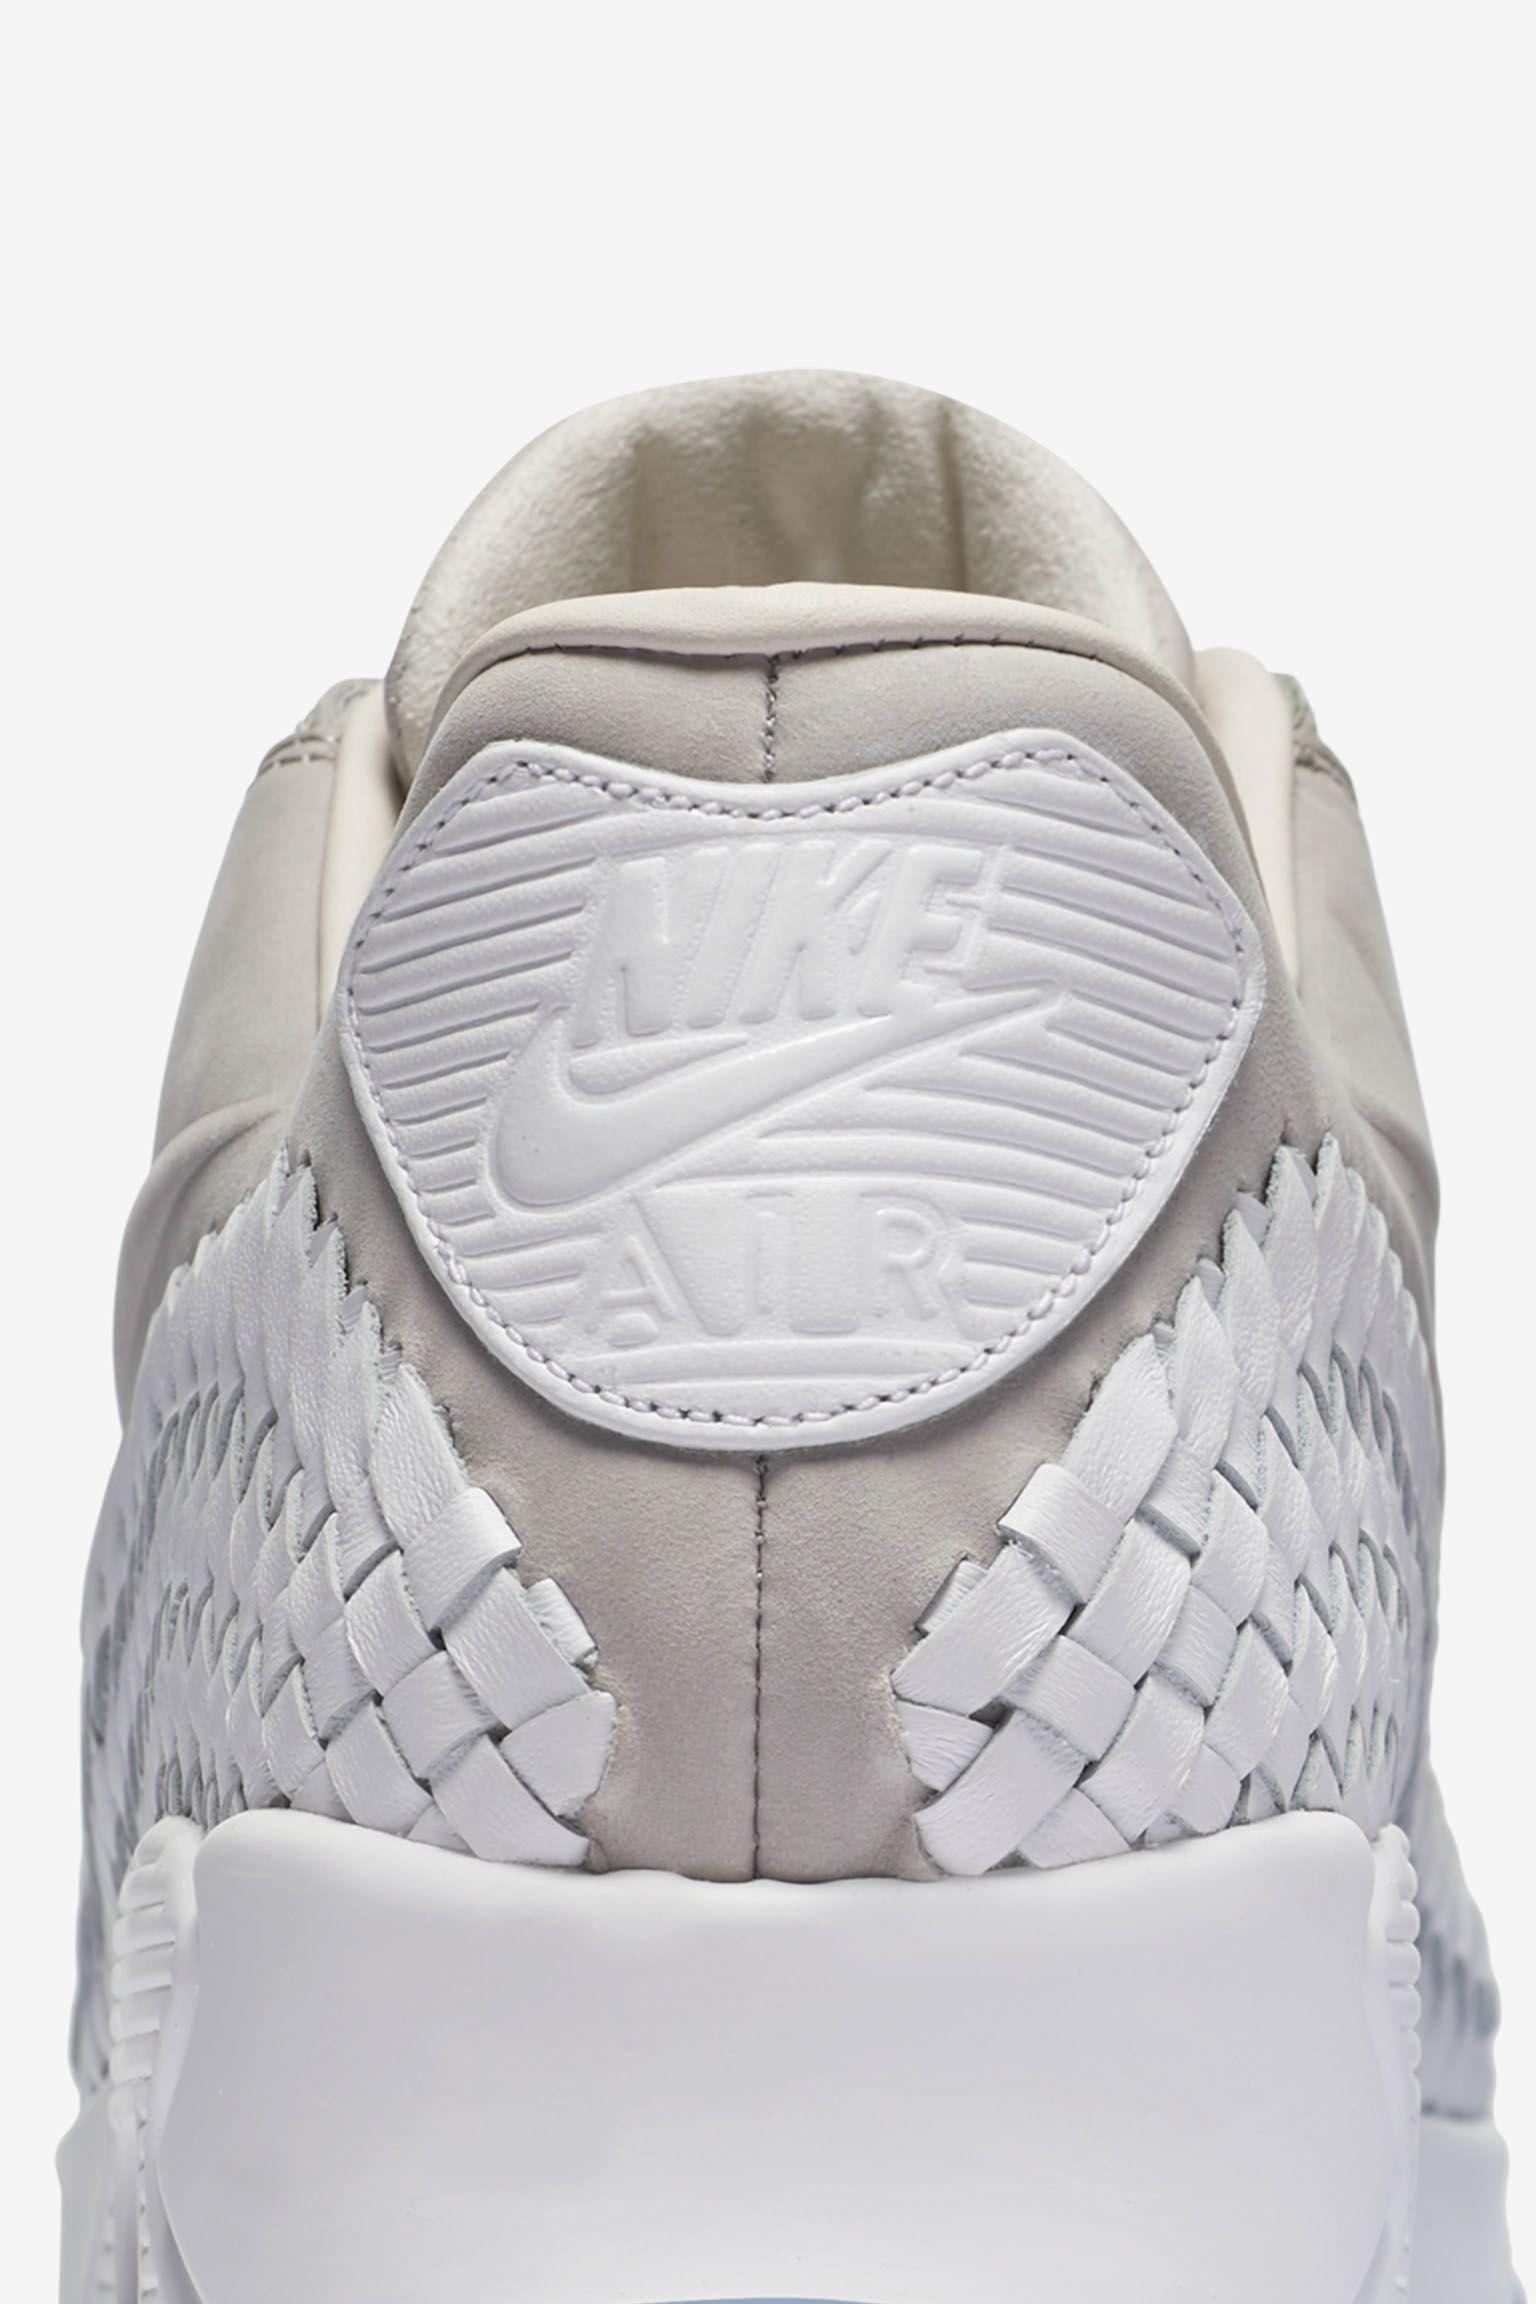 Nike Air Max 90 Woven 'Phantom & White'